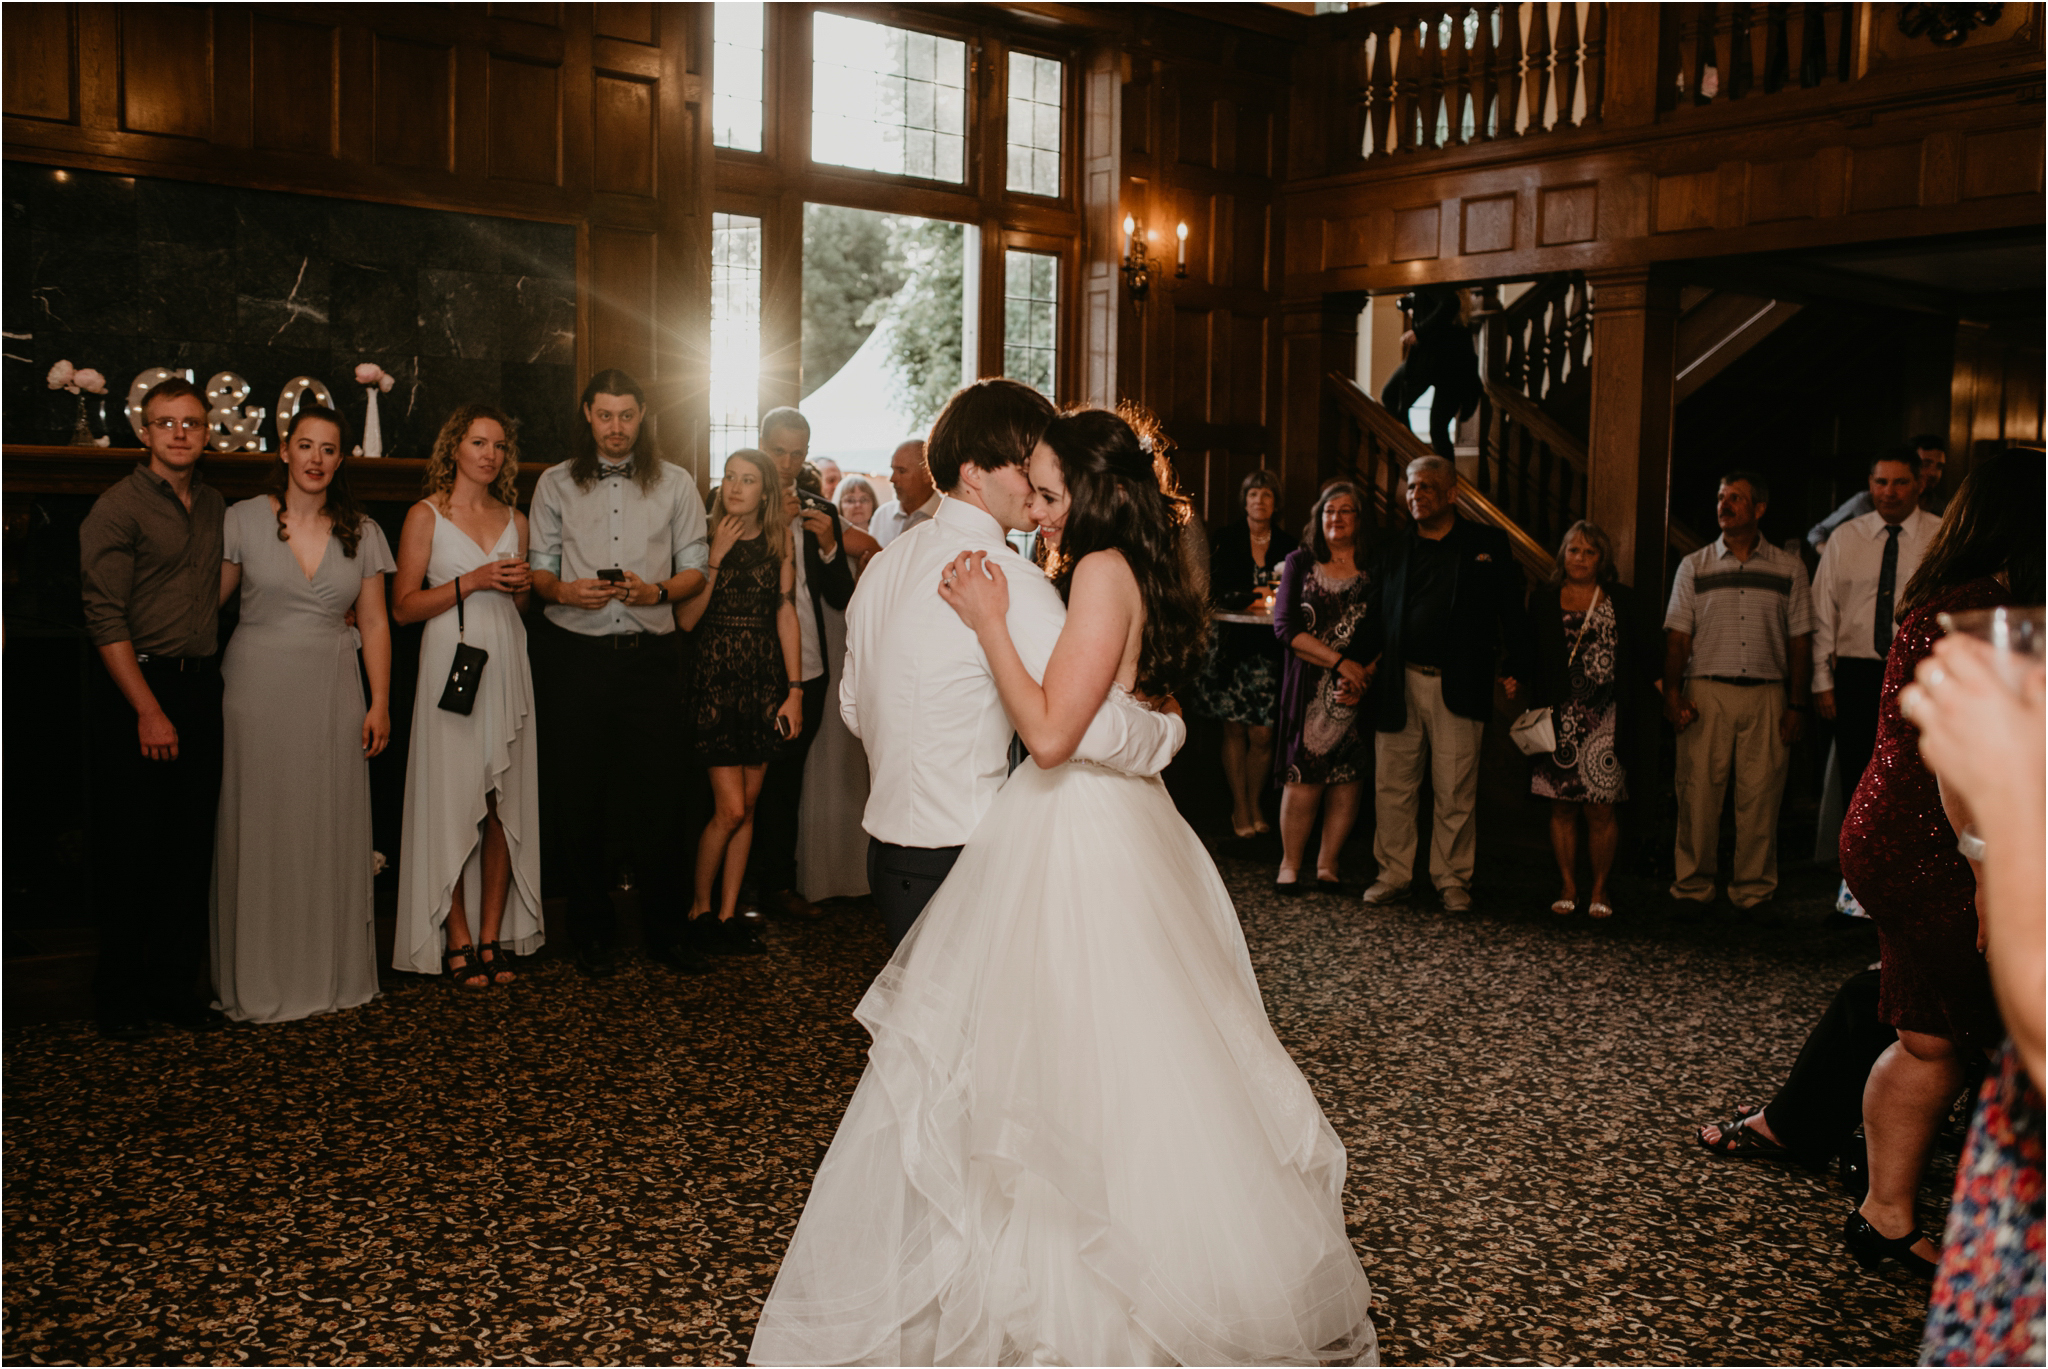 chance-and-ondrea-lairmont-manor-wedding-seattle-photographer-128.jpg